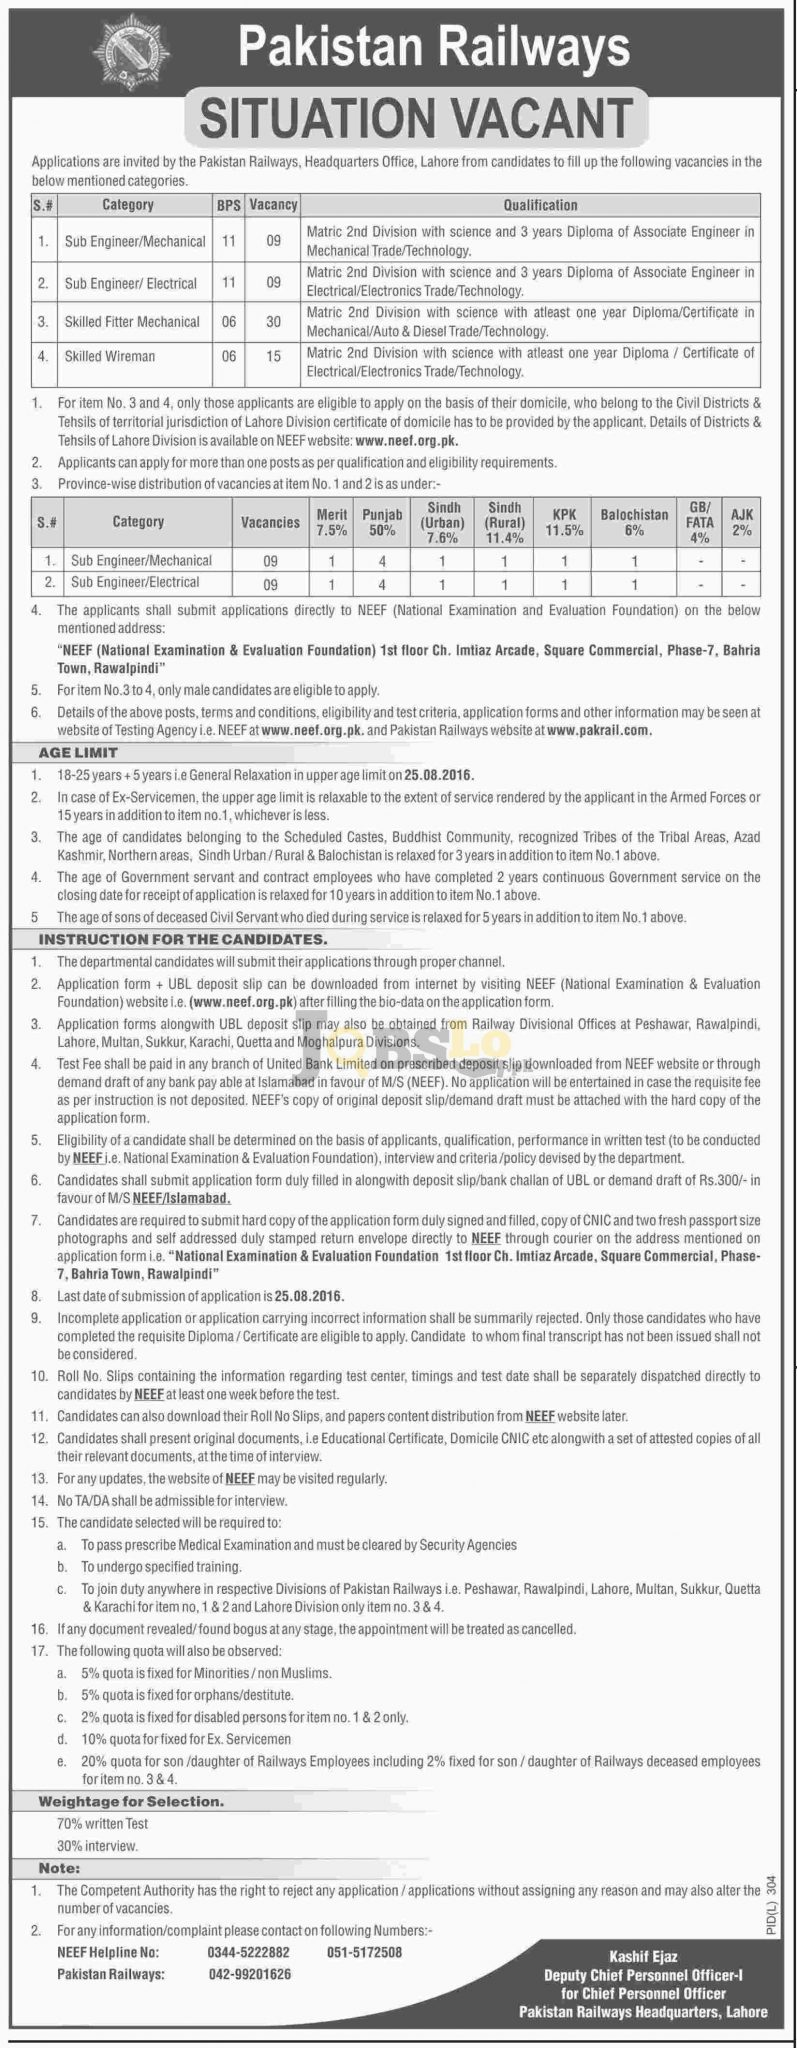 Pakistan Railways Jobs August 2016 NEEF Form Download Test Roll Number Slips